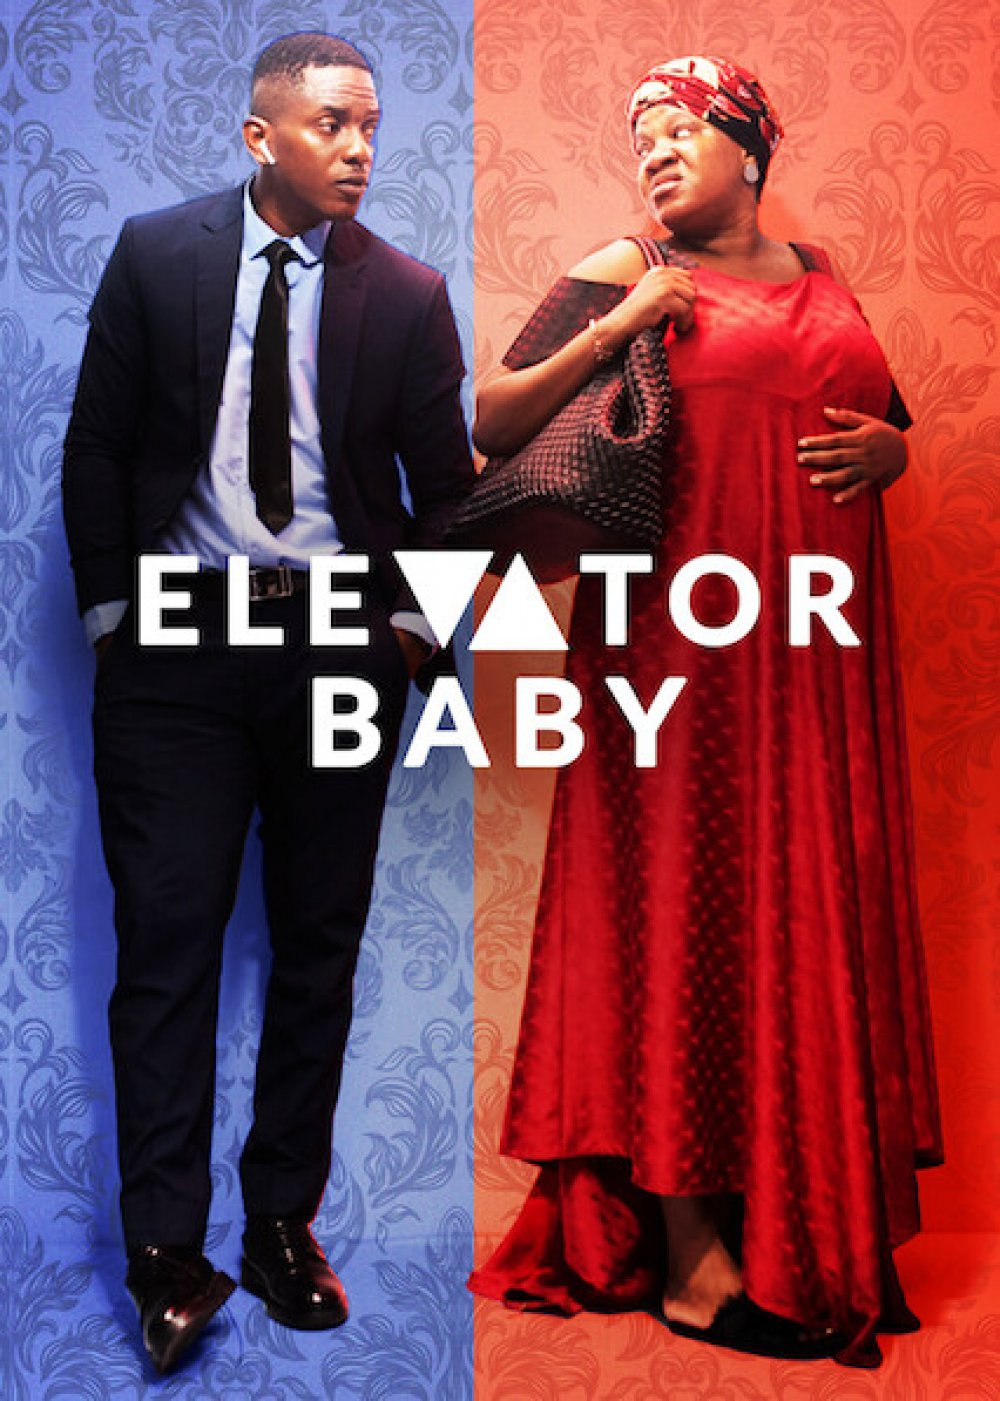 Elevator Baby Movie Poster